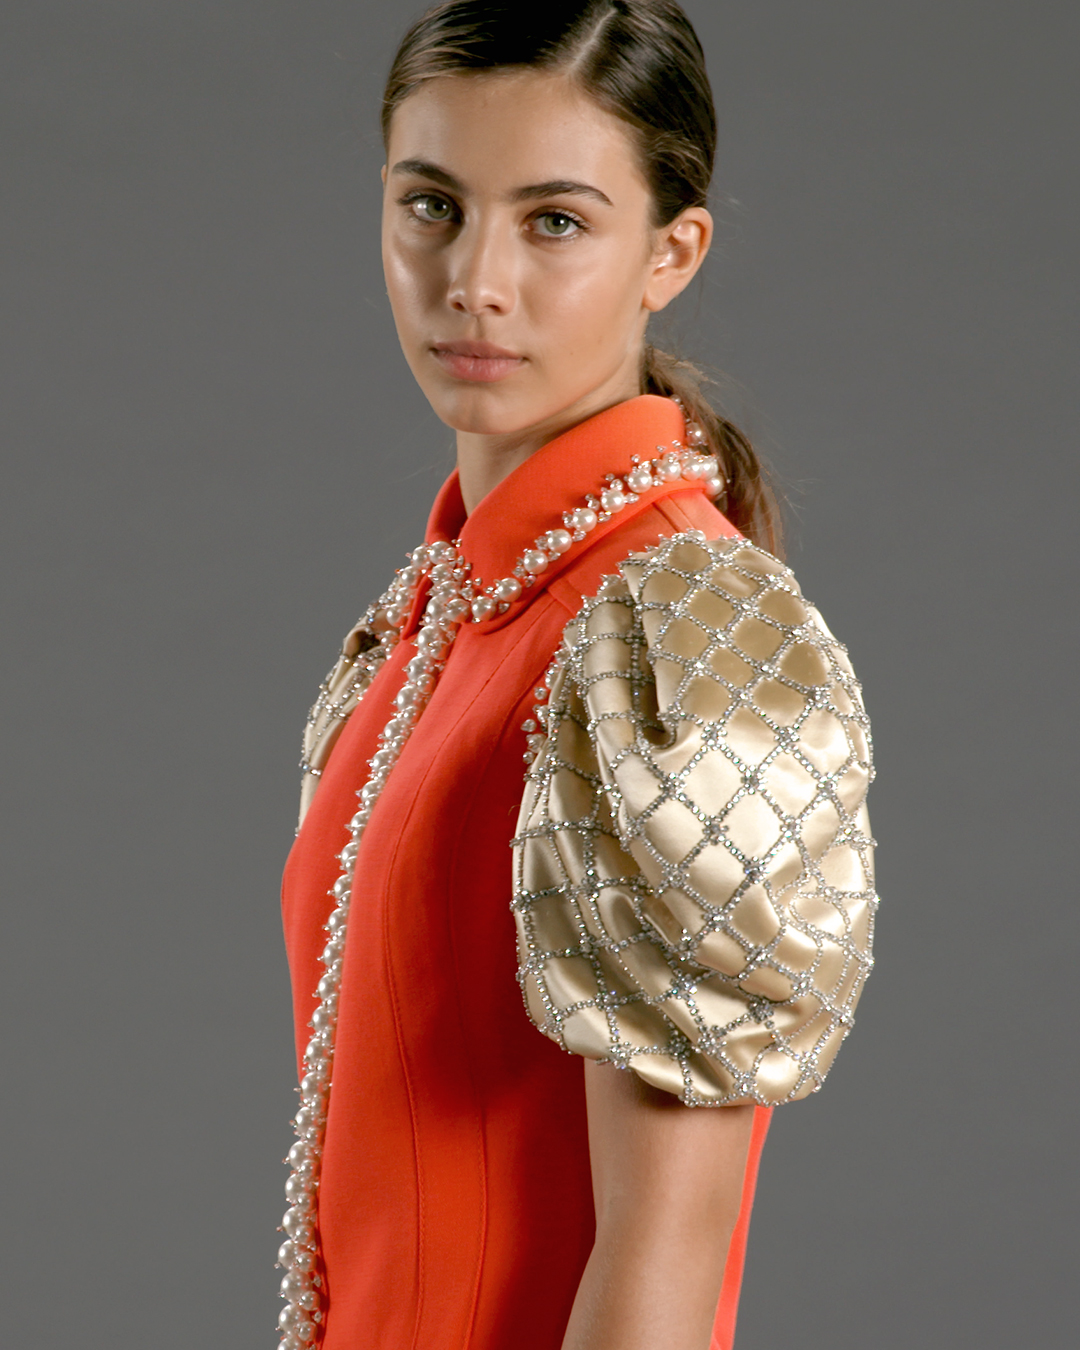 Elisa-Visari-wearing-Upcycled-by-Miu-Miu_01 (1)